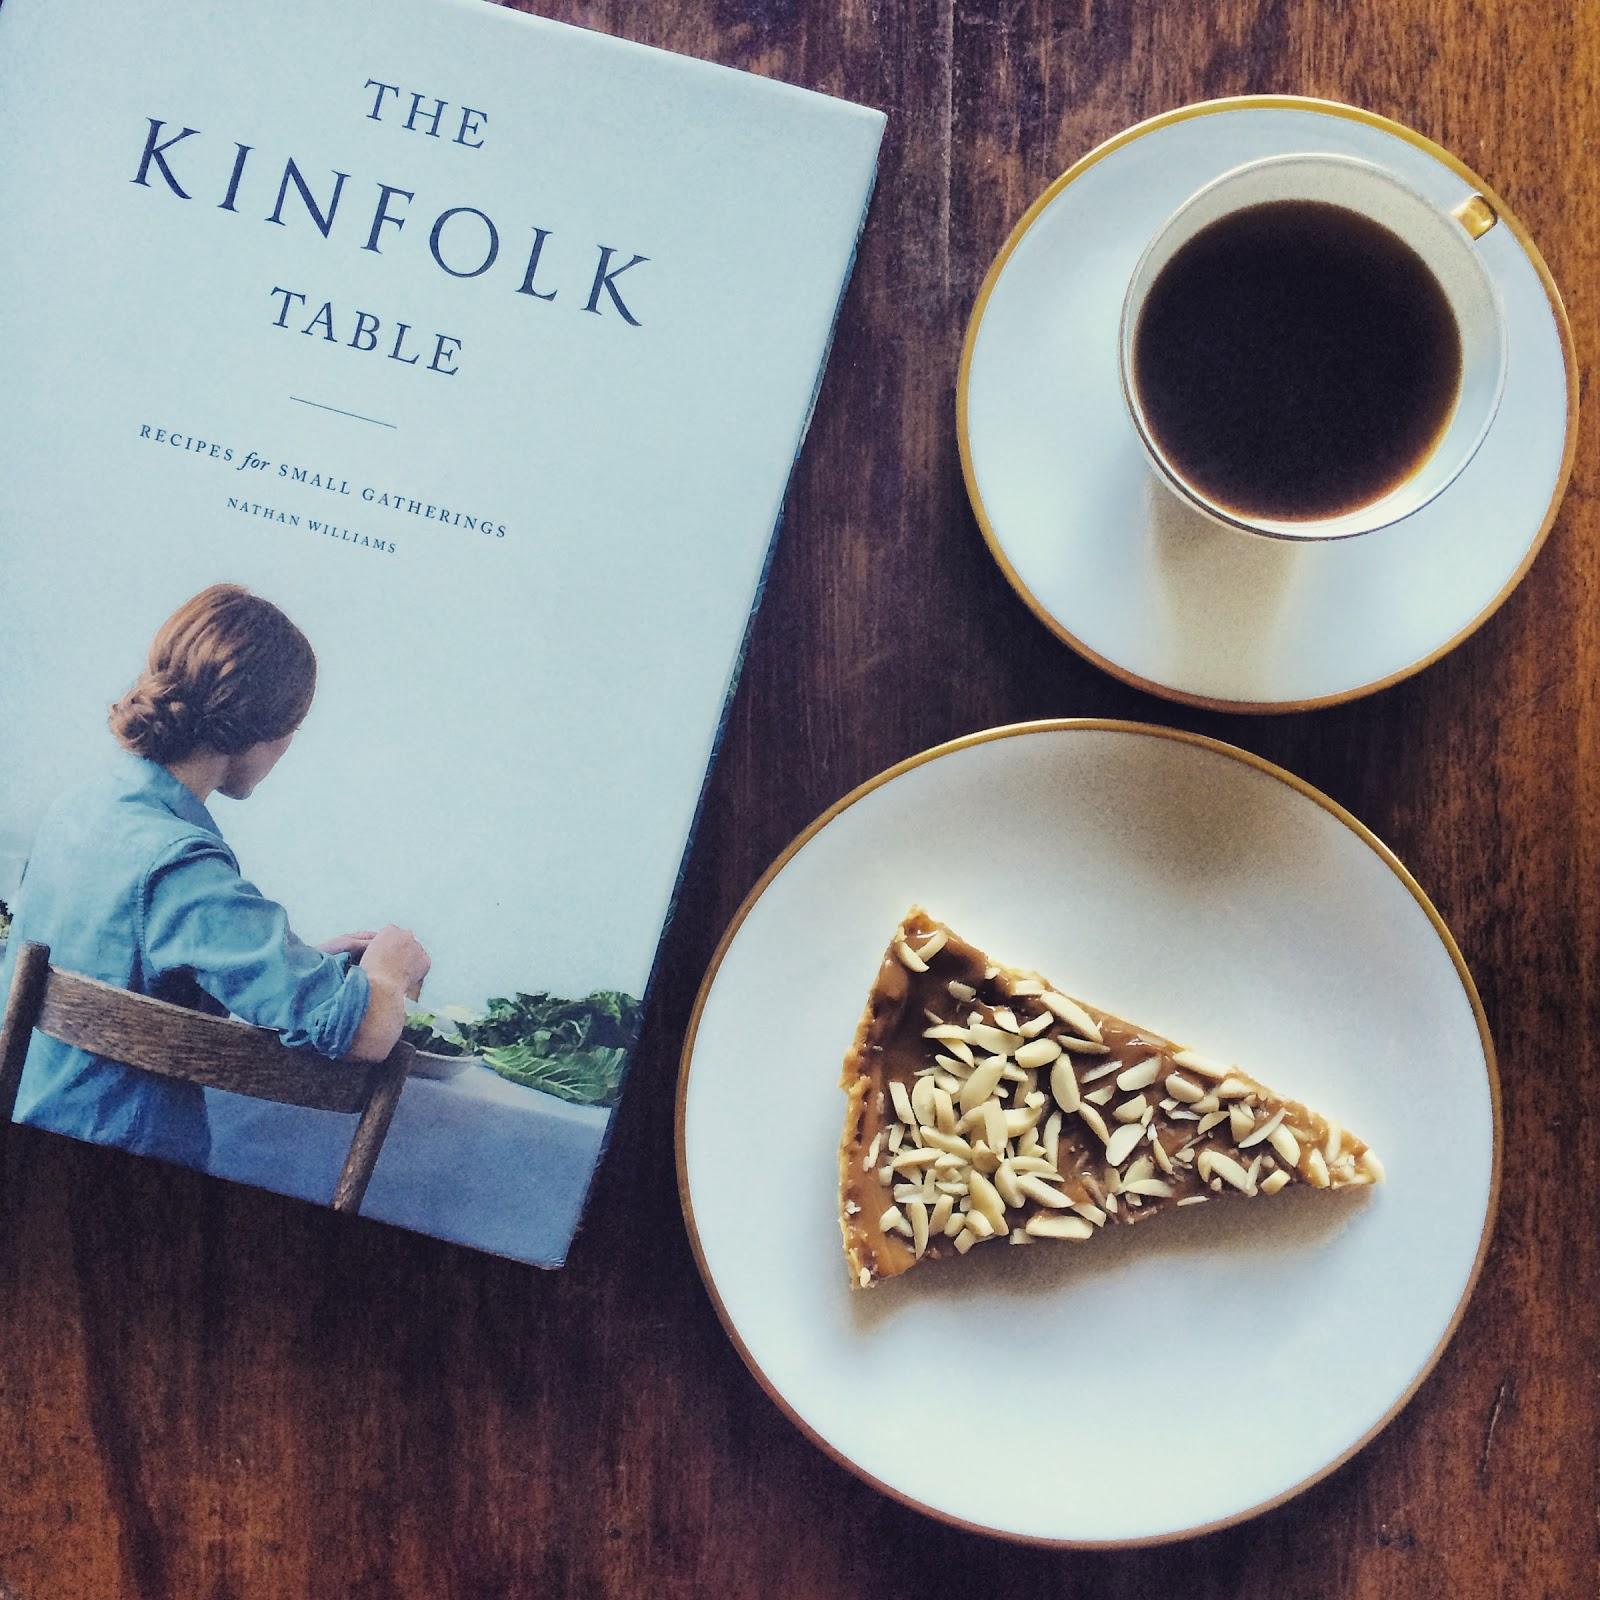 Kinfolk Table by FASHION ART MEDIA